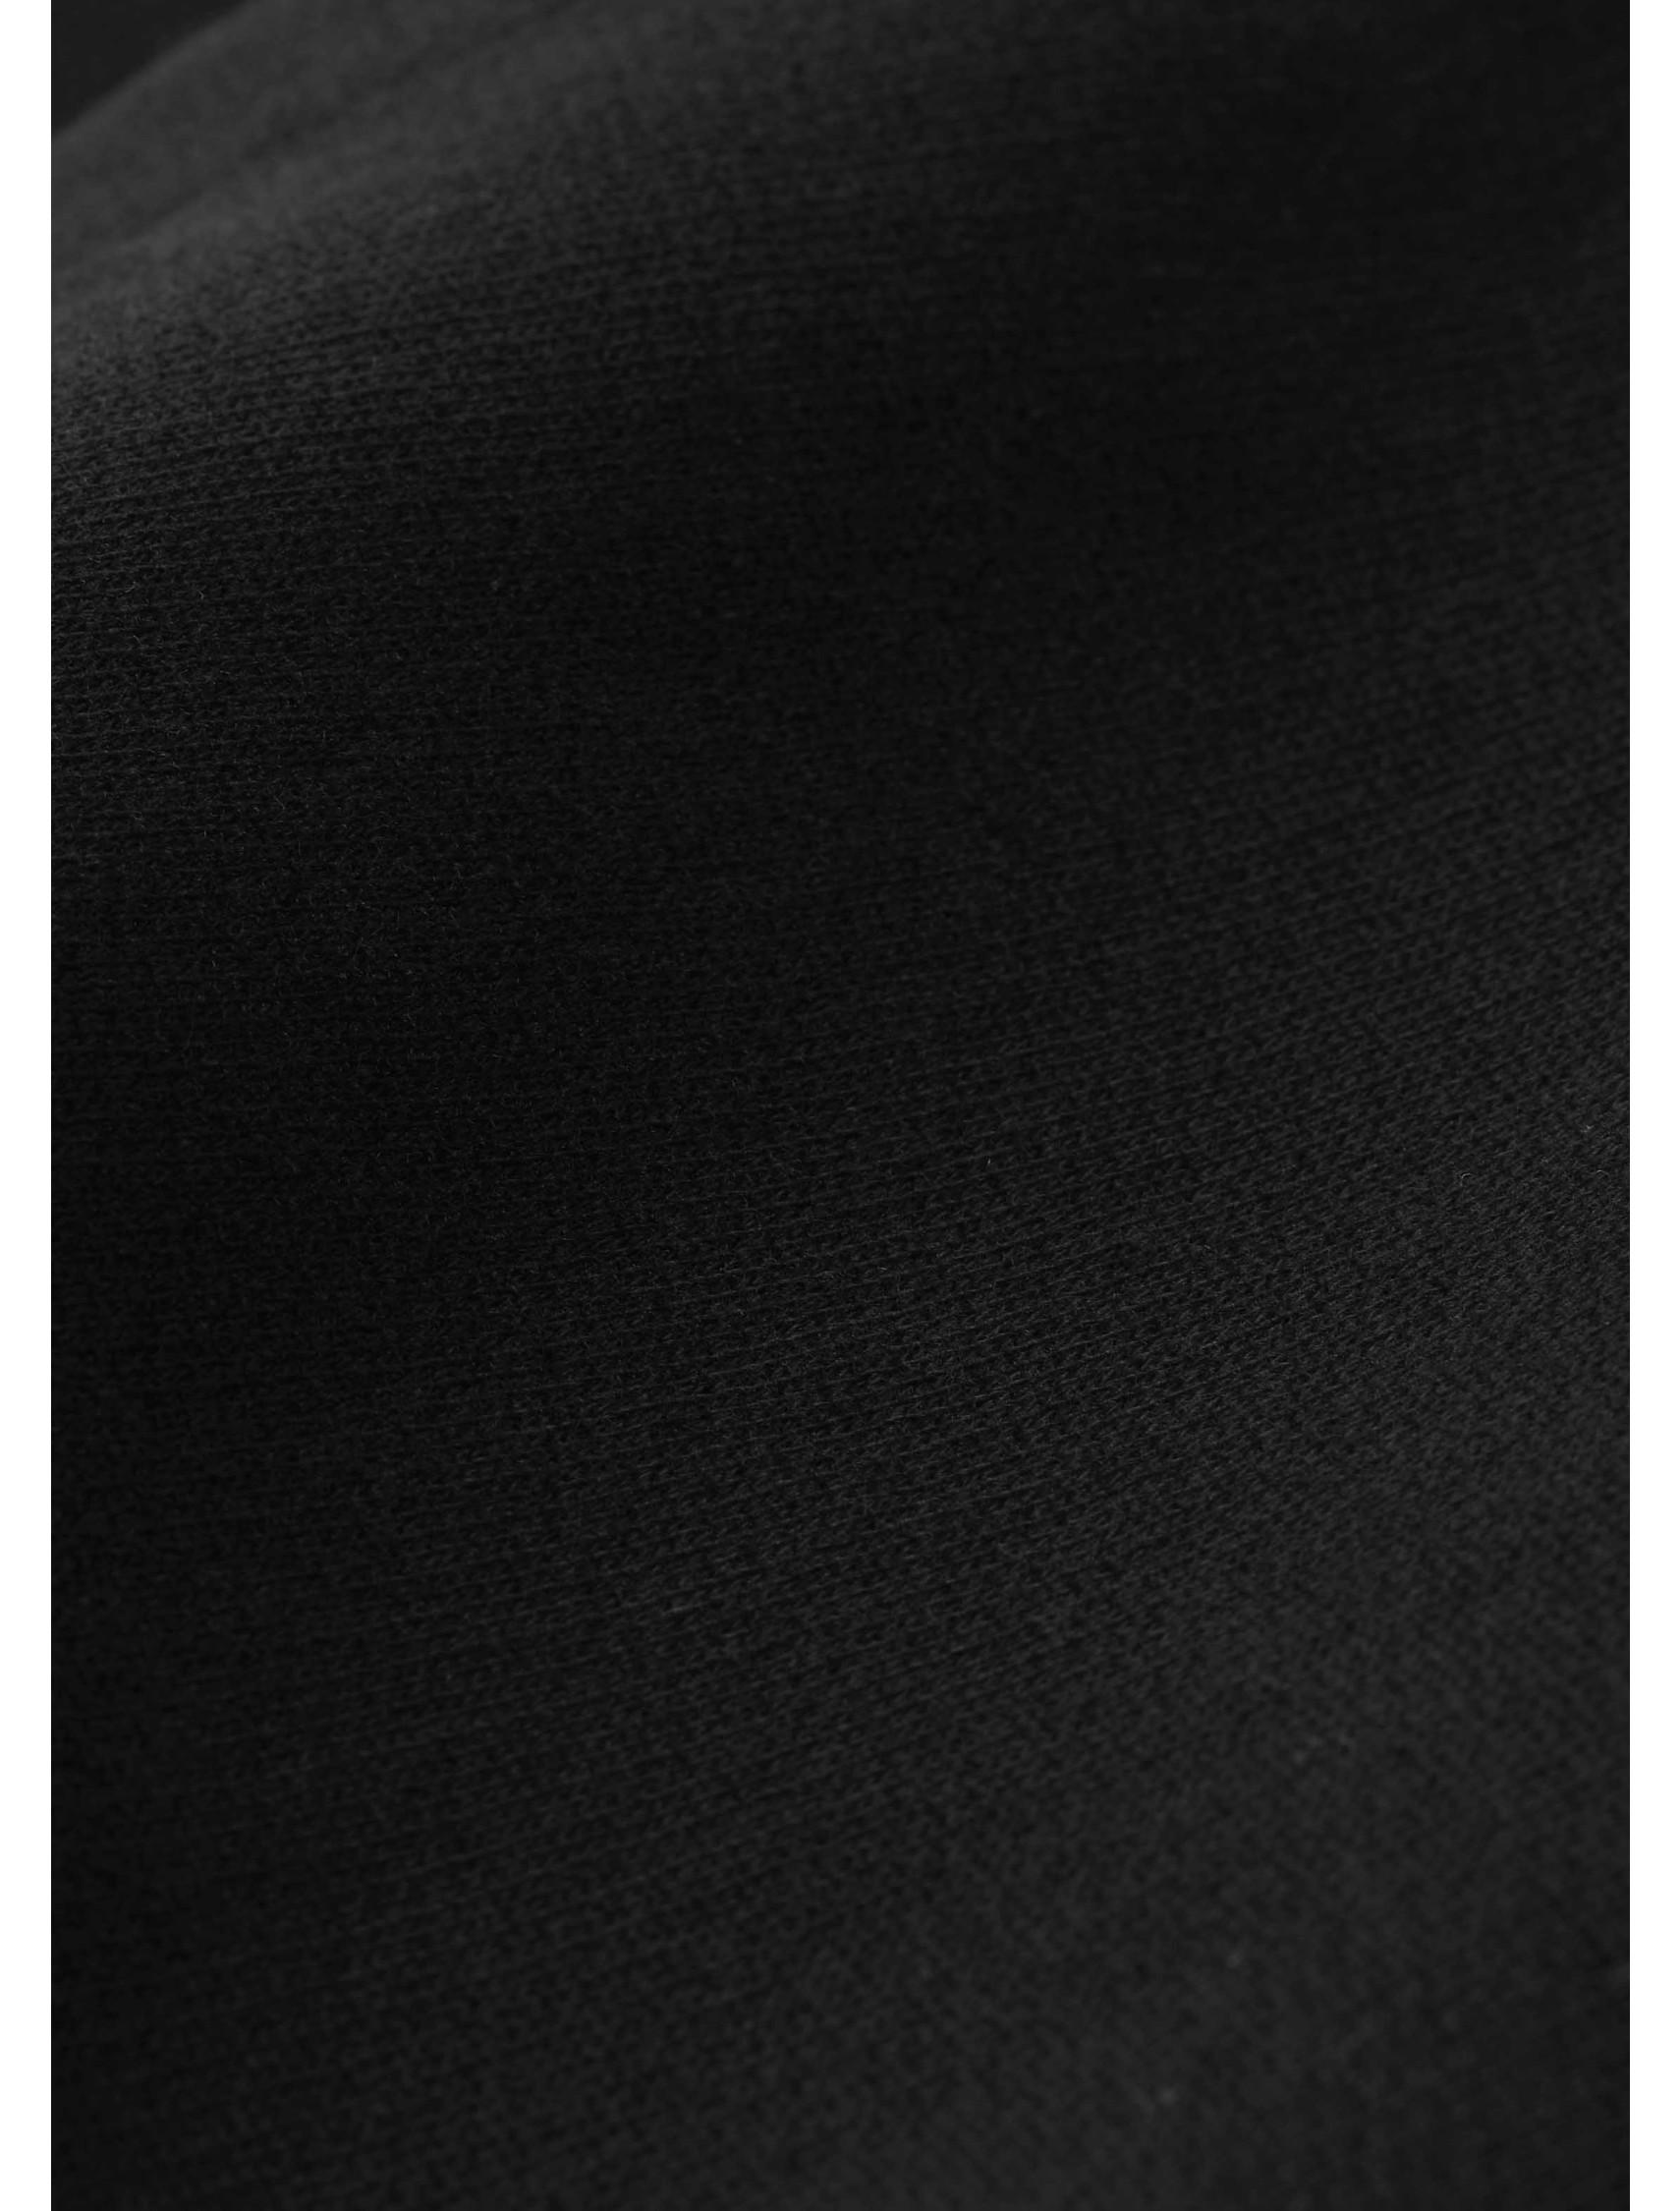 Sweatpants - Midnight Black (last sizes)